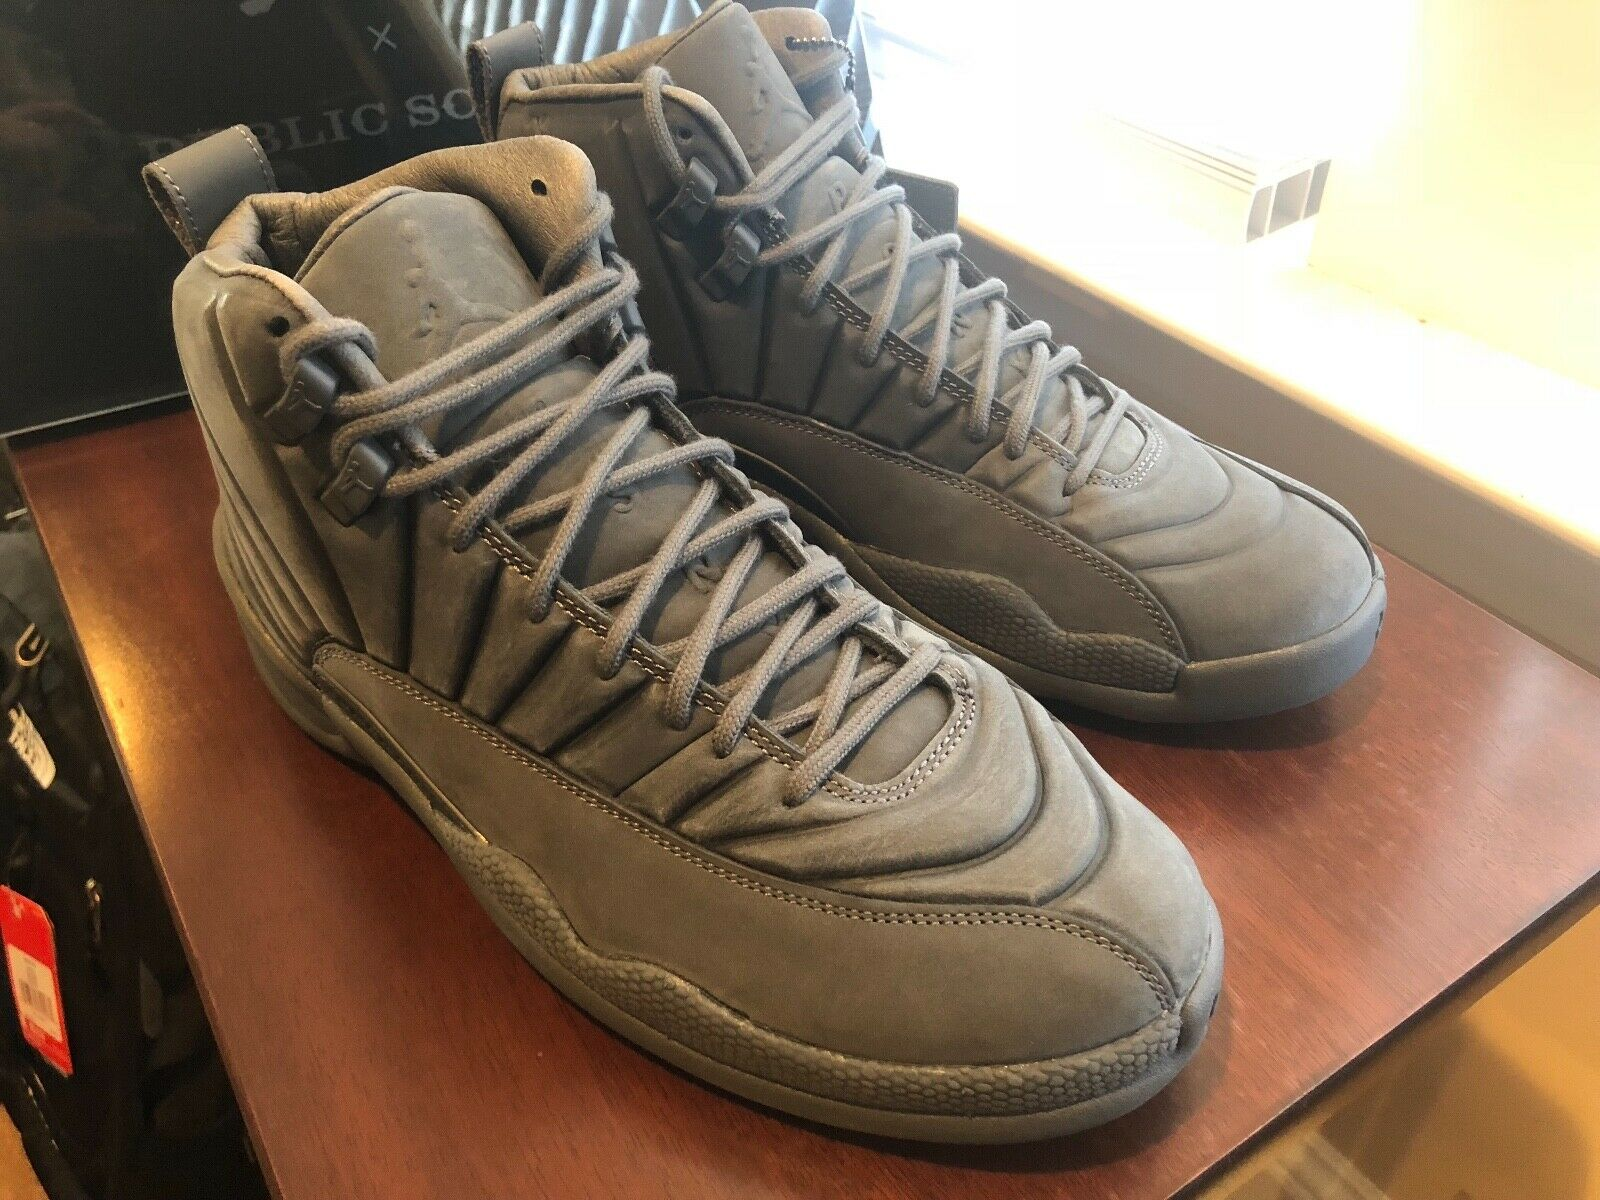 Nike Air Jordan 12 PSNY Retro Dark Grey Size 9. 130690-003 NIB w Receipt